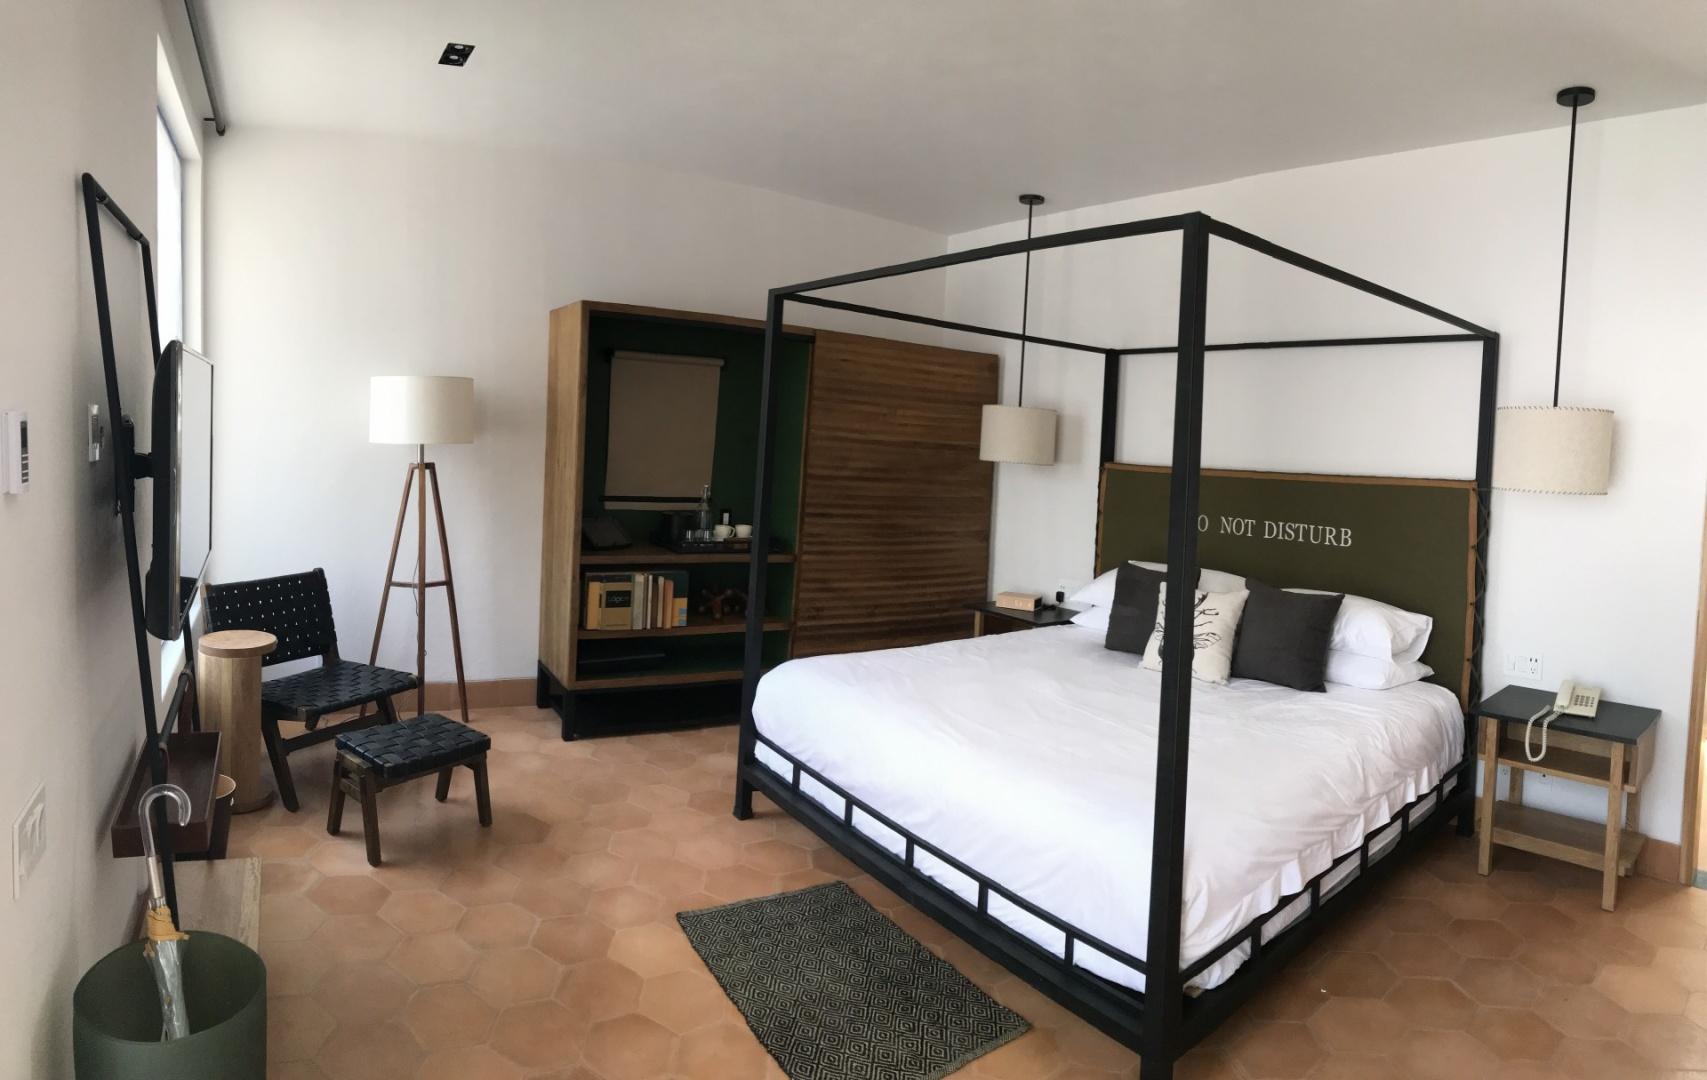 Cinco Rodavento - Hotel en Valle de Bravo.